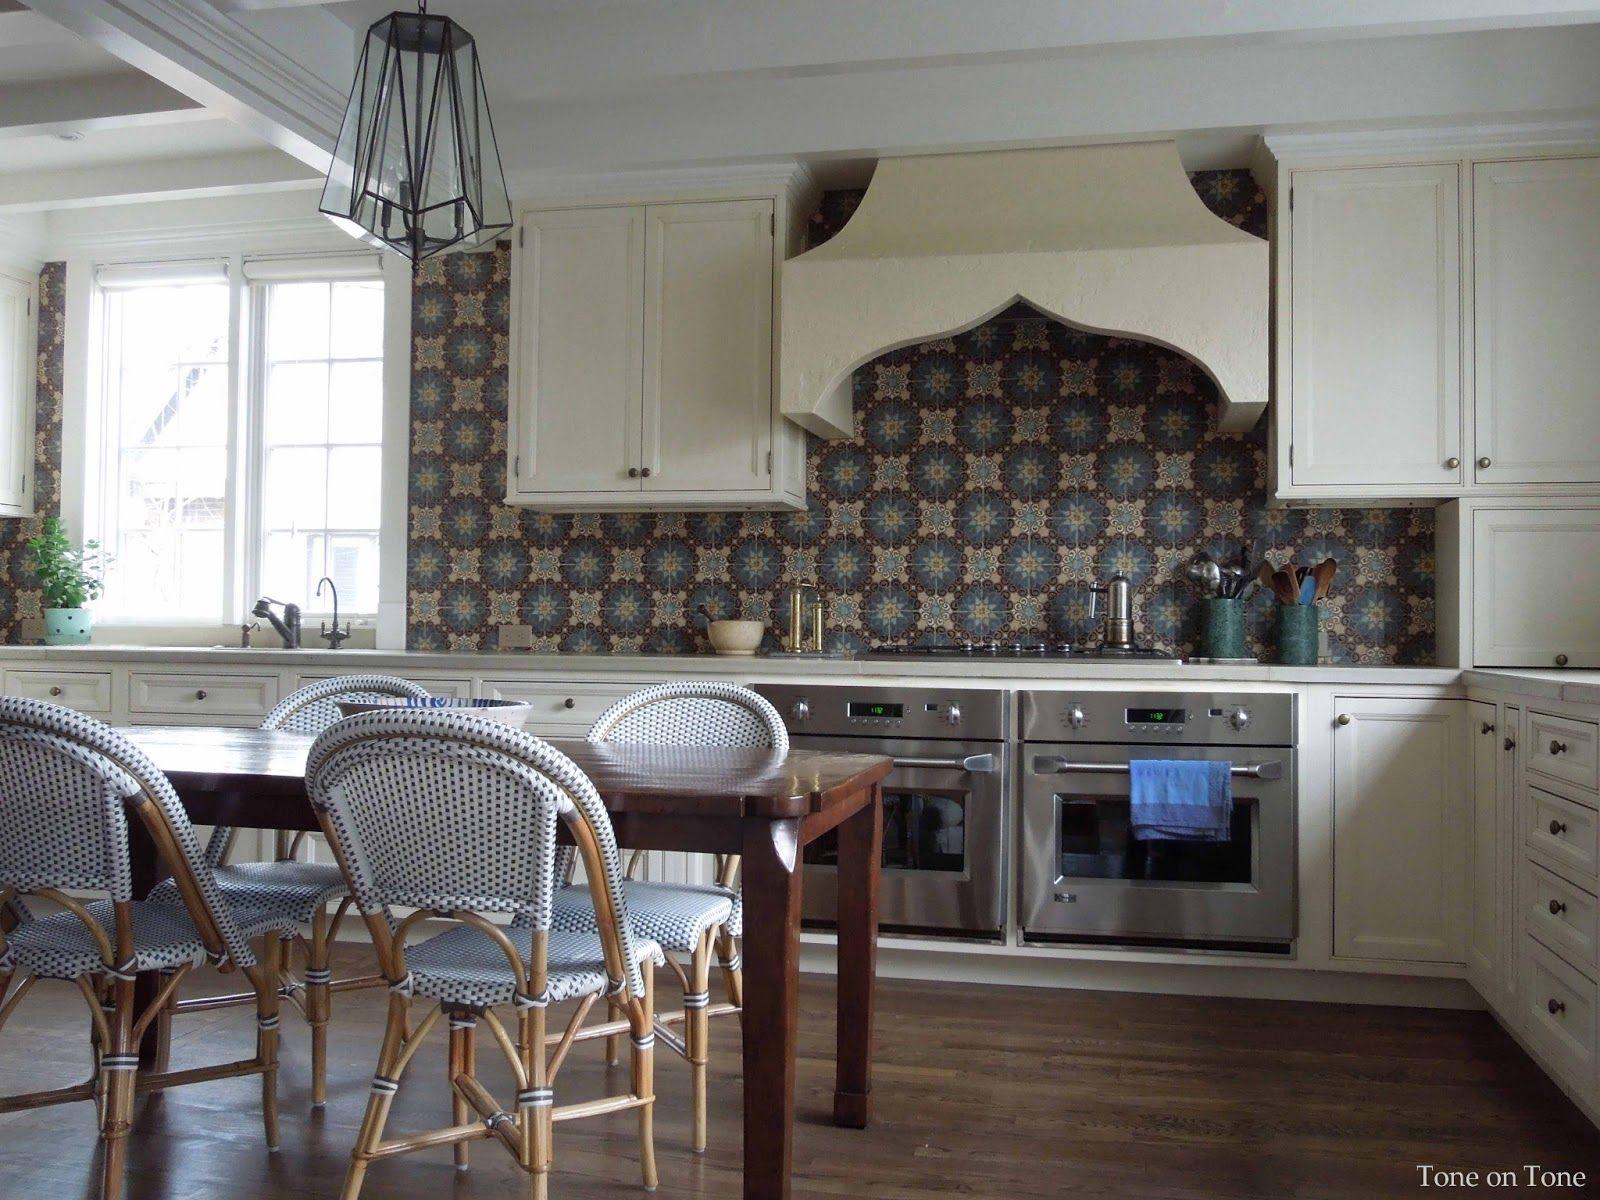 Uncategorized Lobkovich Kitchen Designs tone on lobkovich kitchen designs cabinetry mission tile west tiles available through